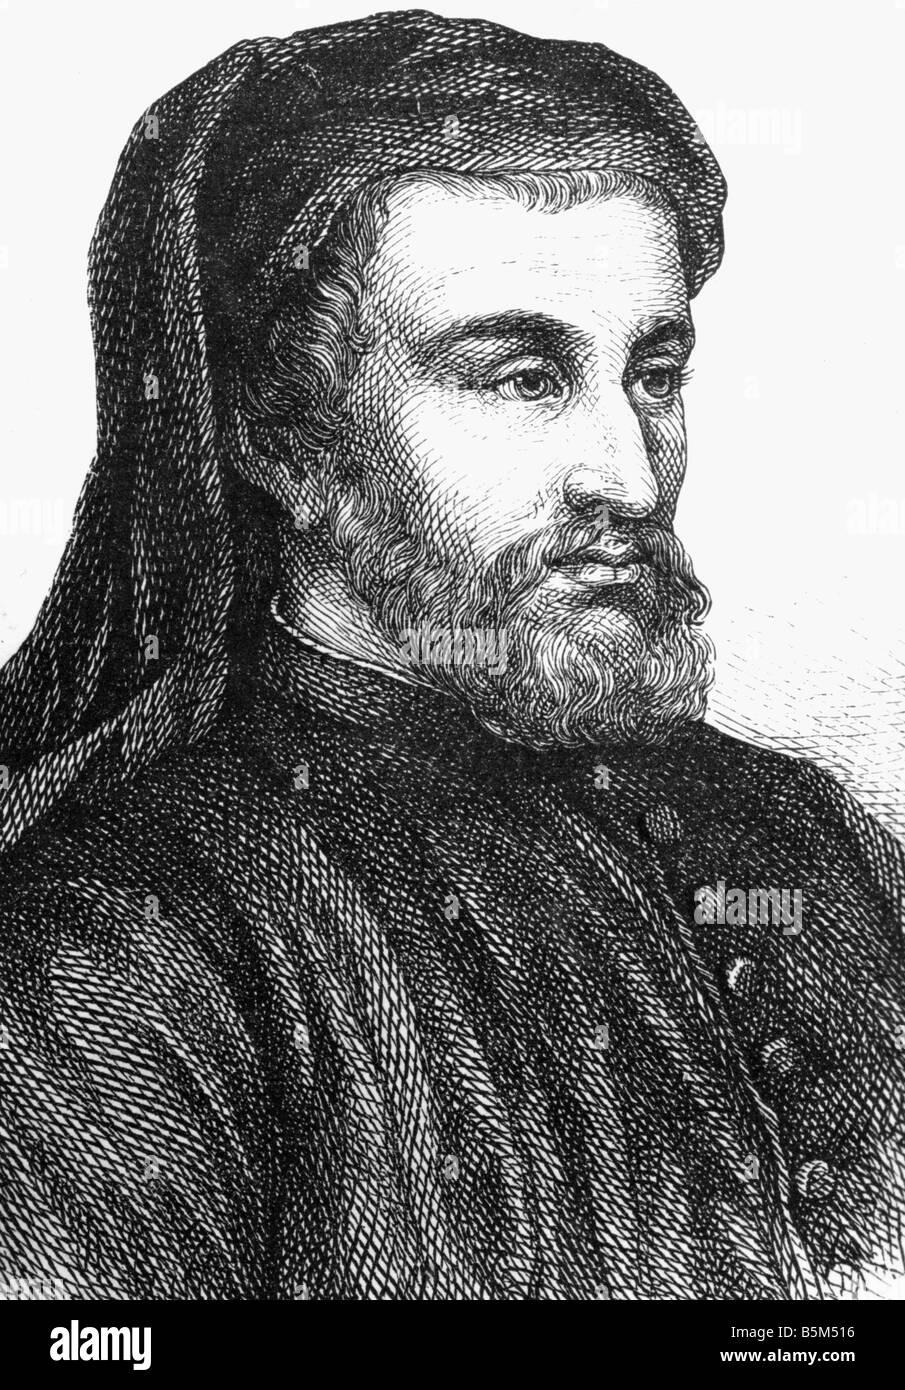 Chaucer, Geoffrey, circa 1340 - 25.10.1400, English auhtor / writer,  portrait, wood engraving, 19th century, , - Stock Image